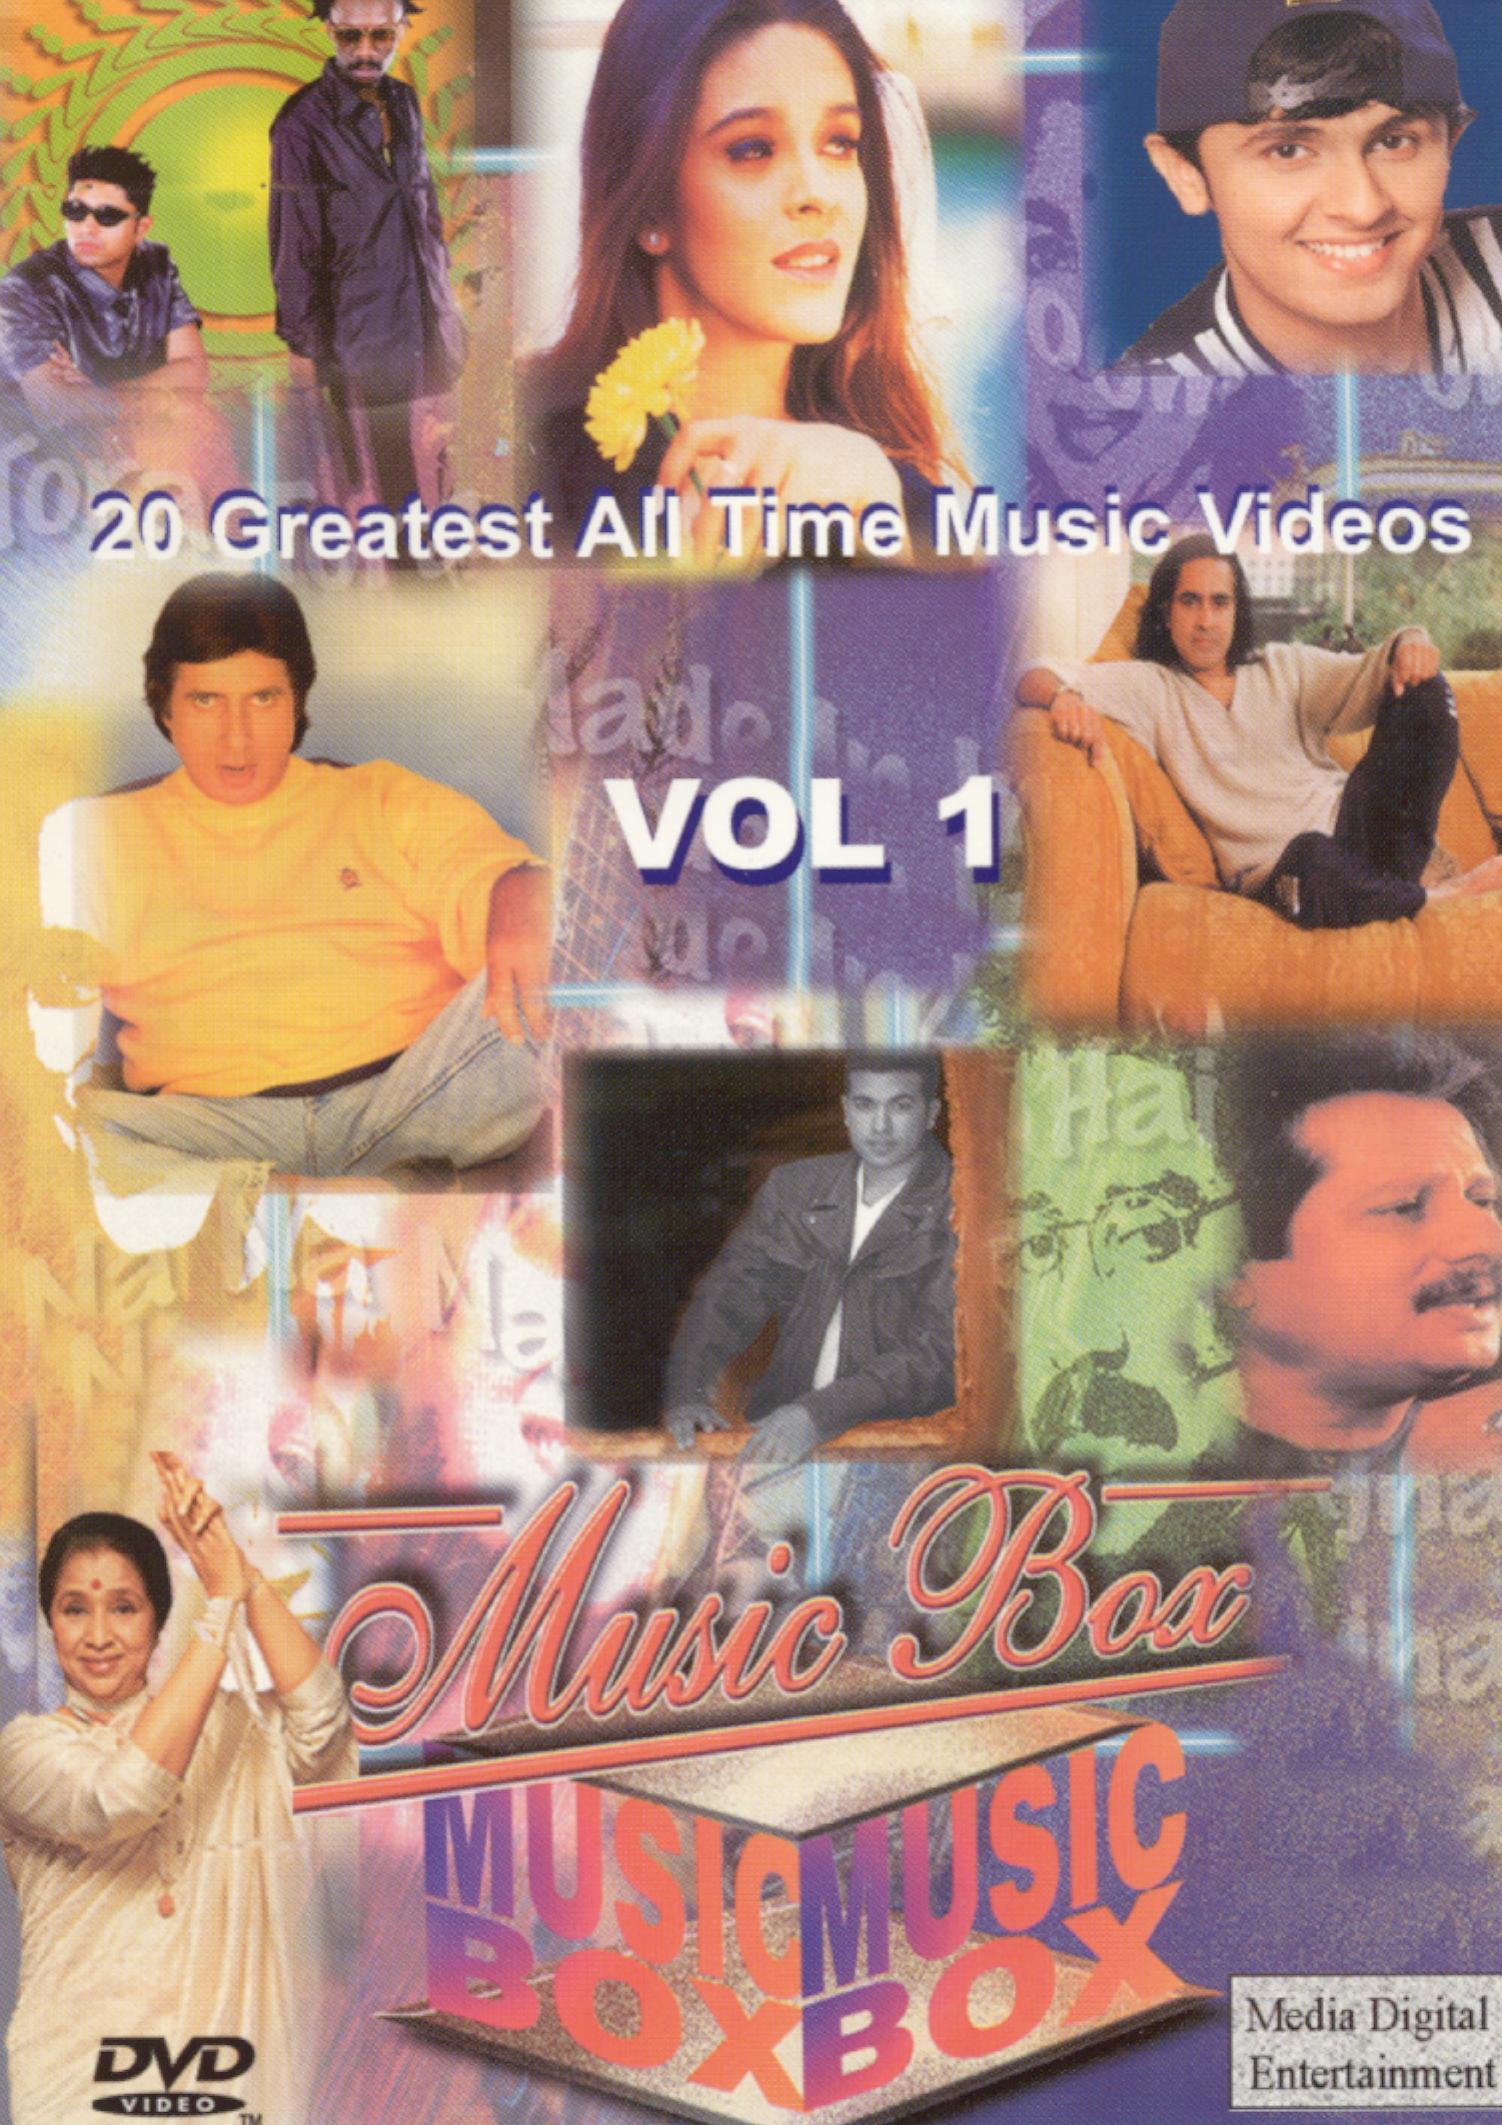 Music Box, Vol. 1